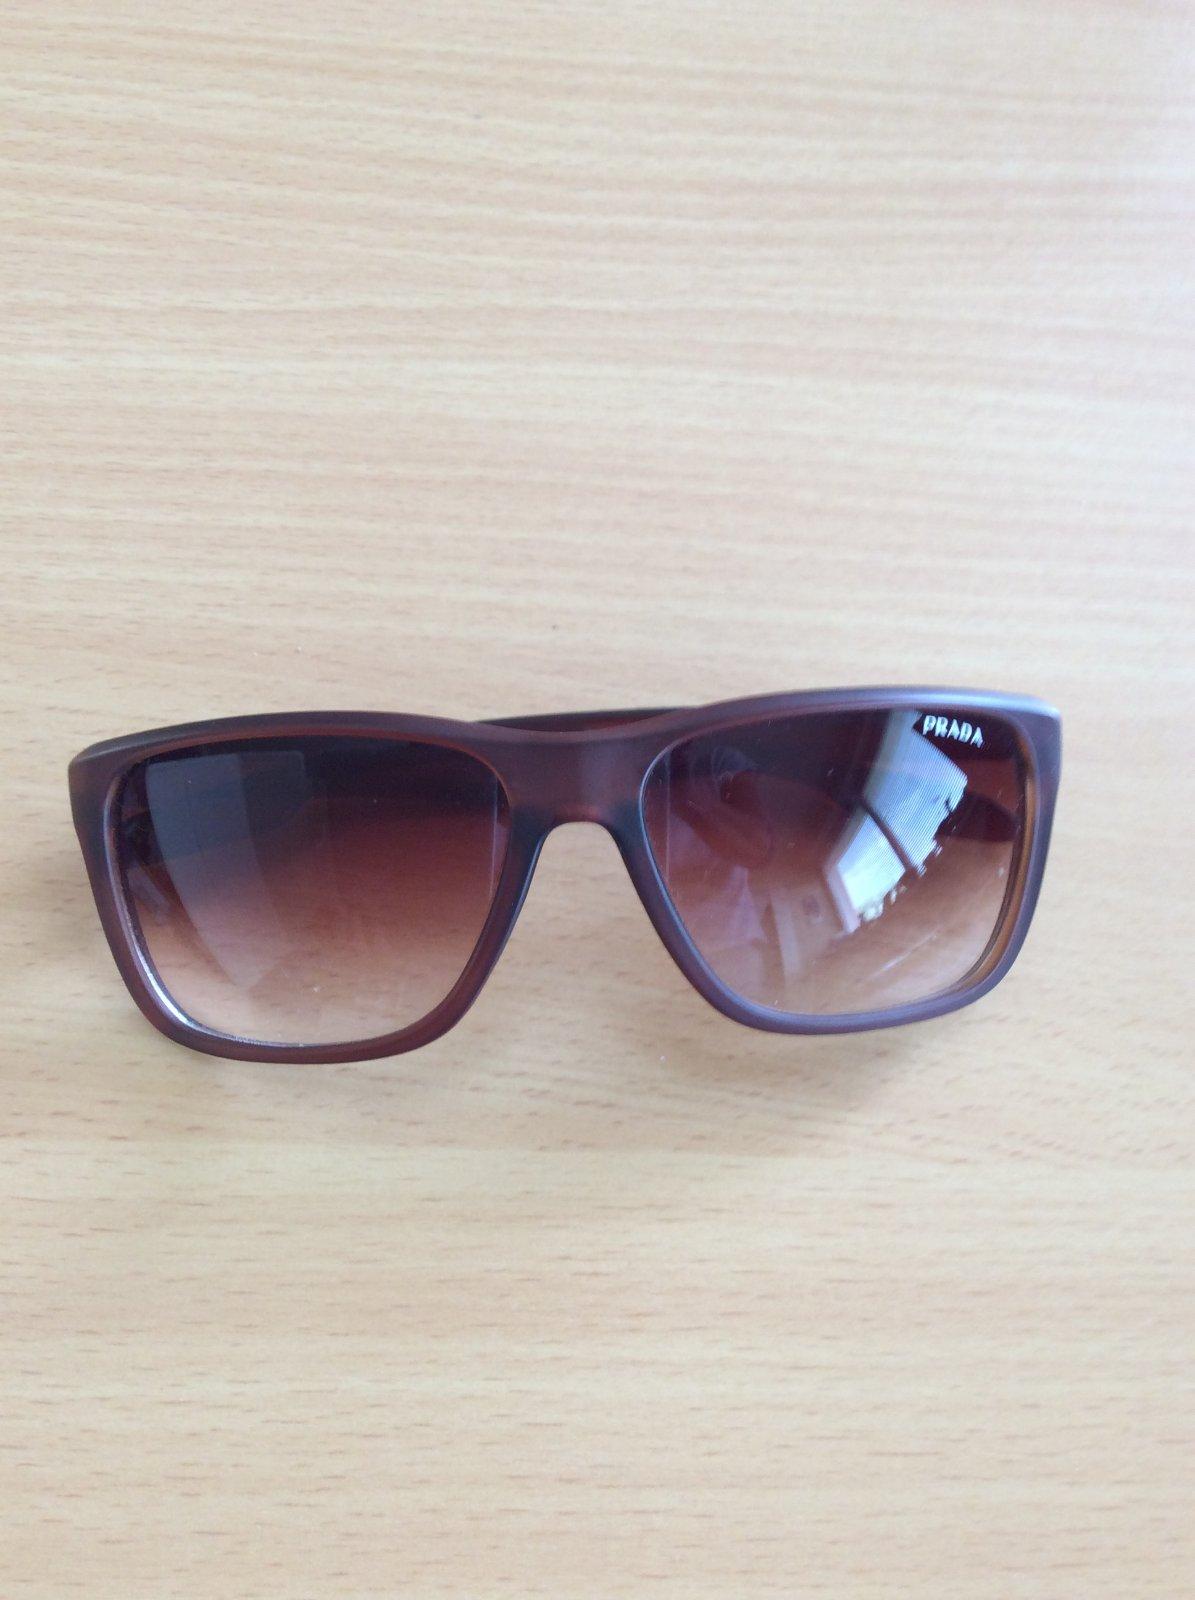 Kvalitné okuliare prada 48e9cfde8e2